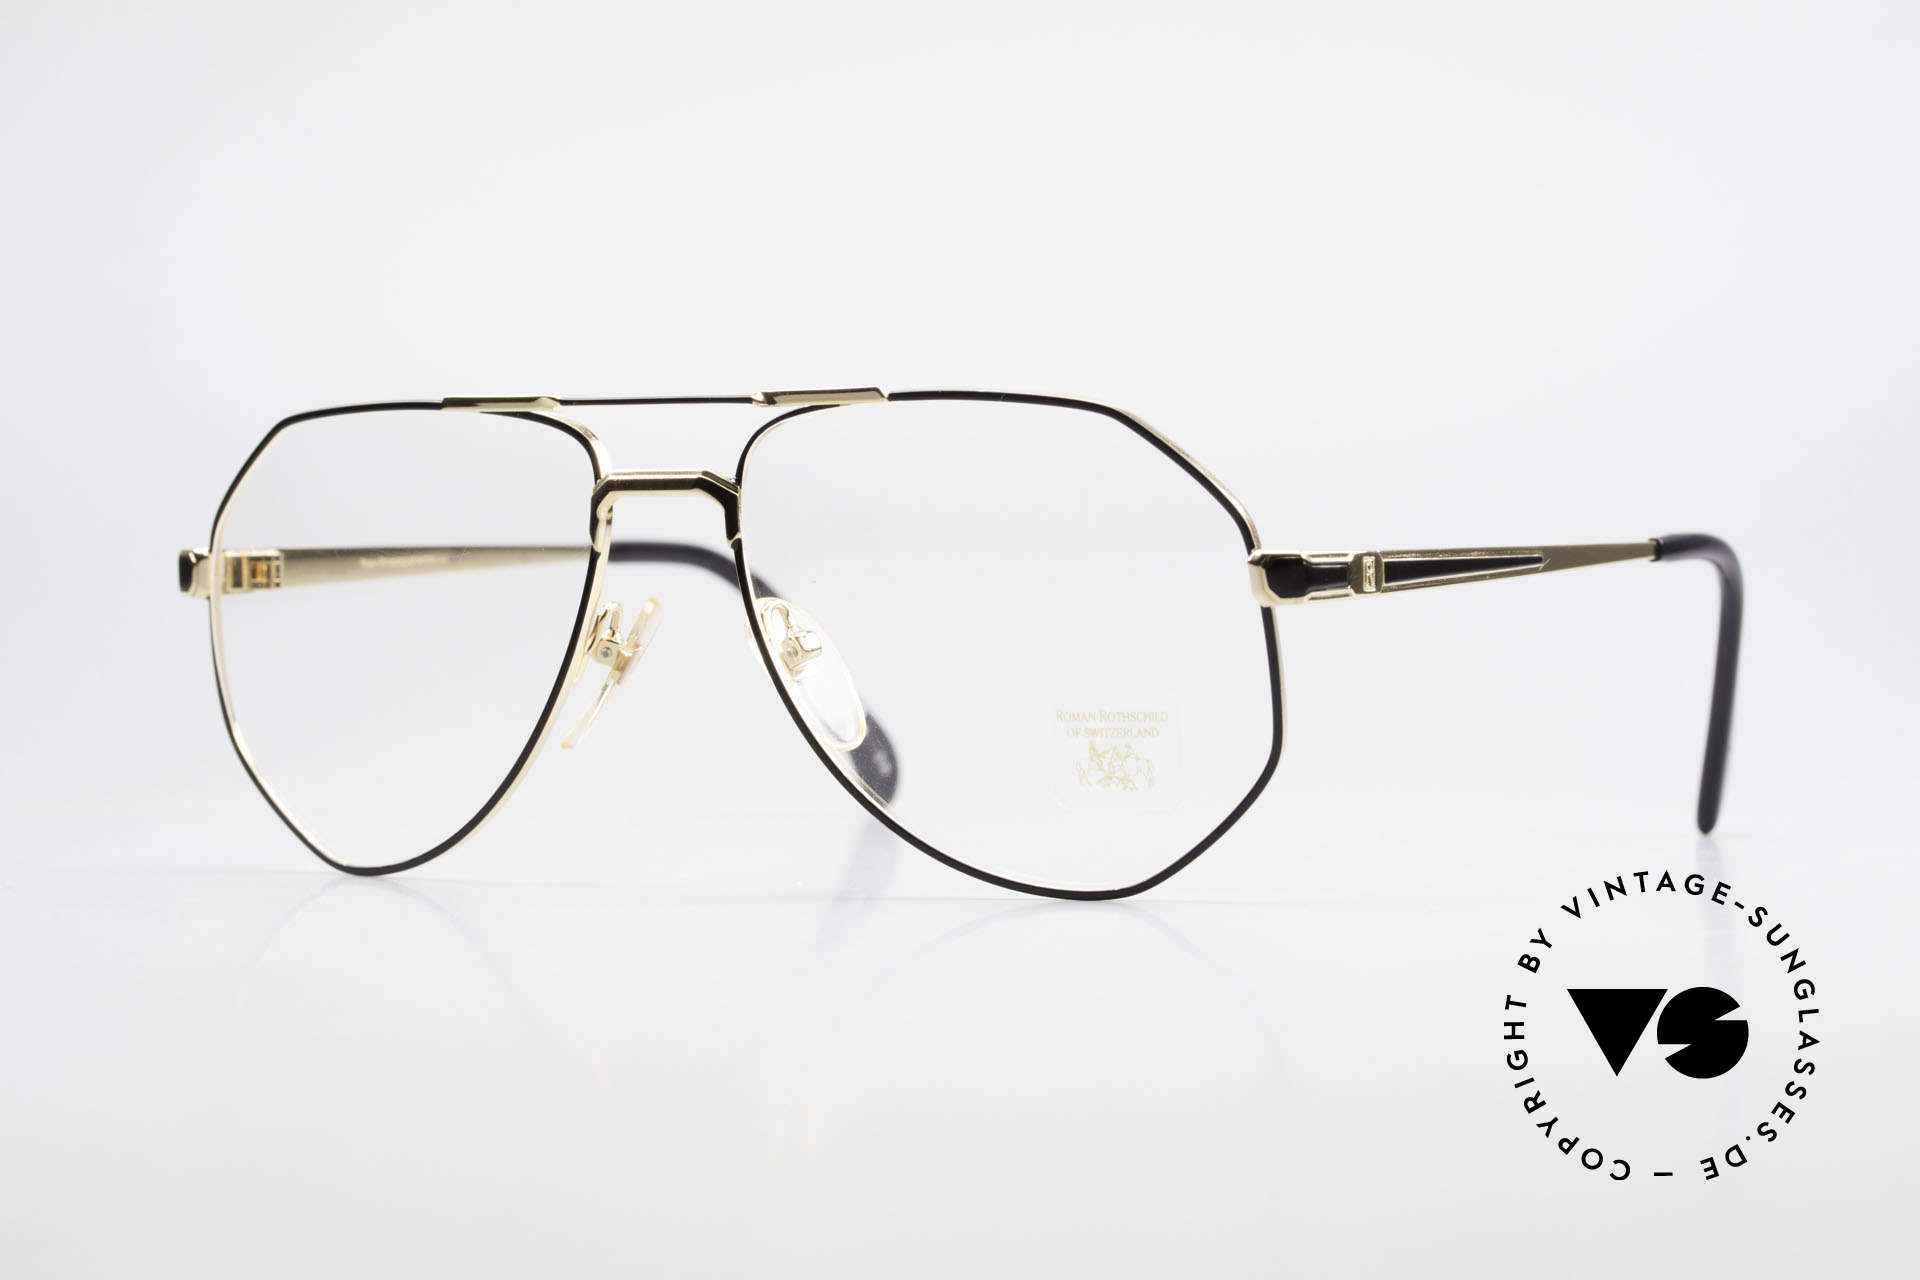 Roman Rothschild R16 Gold Plated Luxury Glasses, Roman ROTHSCHILD of Switzerland luxury eyeglasses, Made for Men